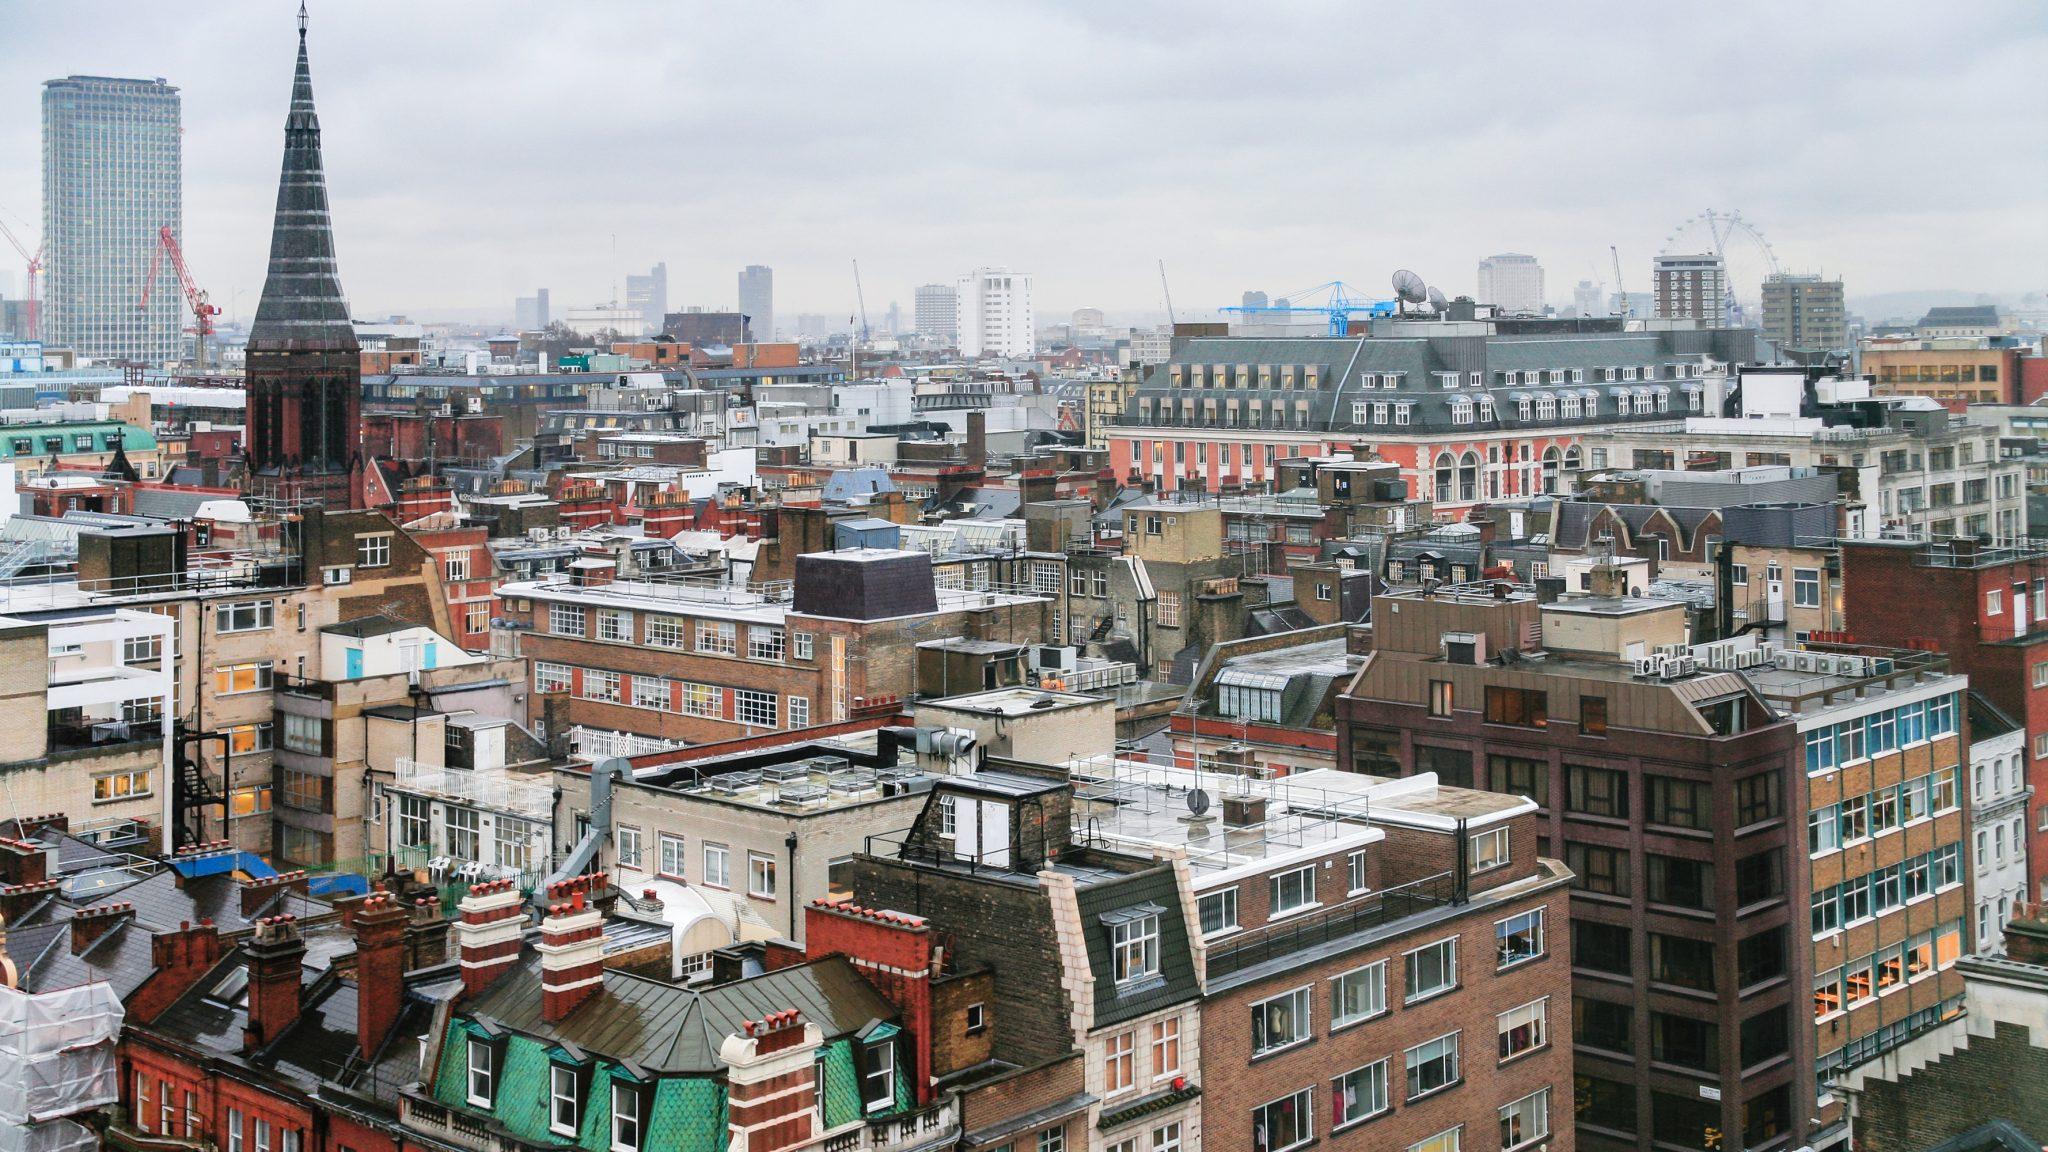 Soho London skyline